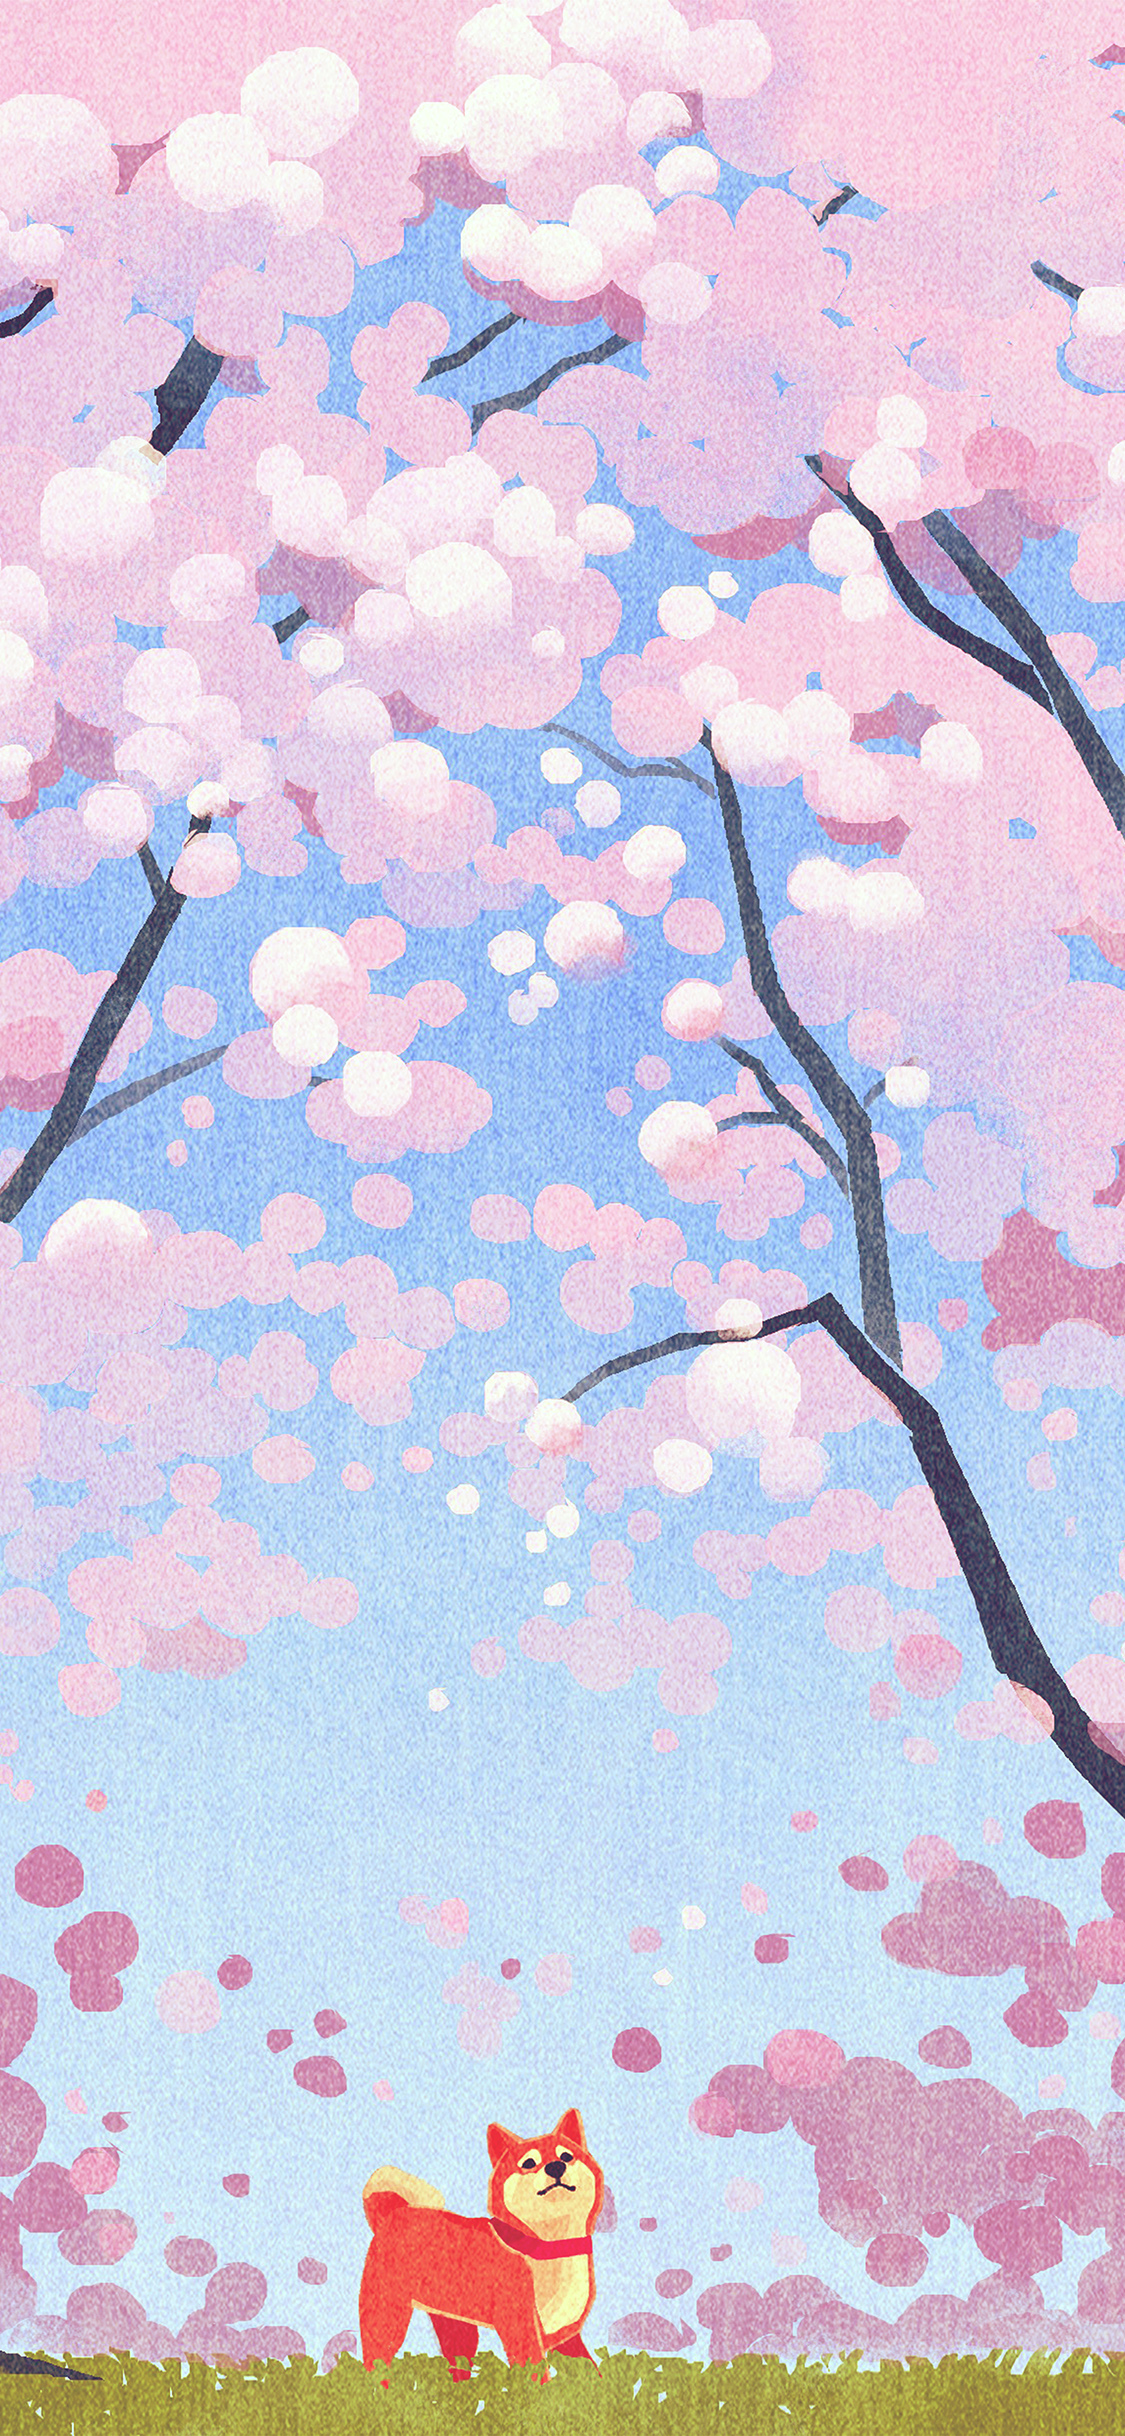 iPhonexpapers.com-Apple-iPhone-wallpaper-ba59-cute-siba-dog-animal-spring-illustration-art-pink